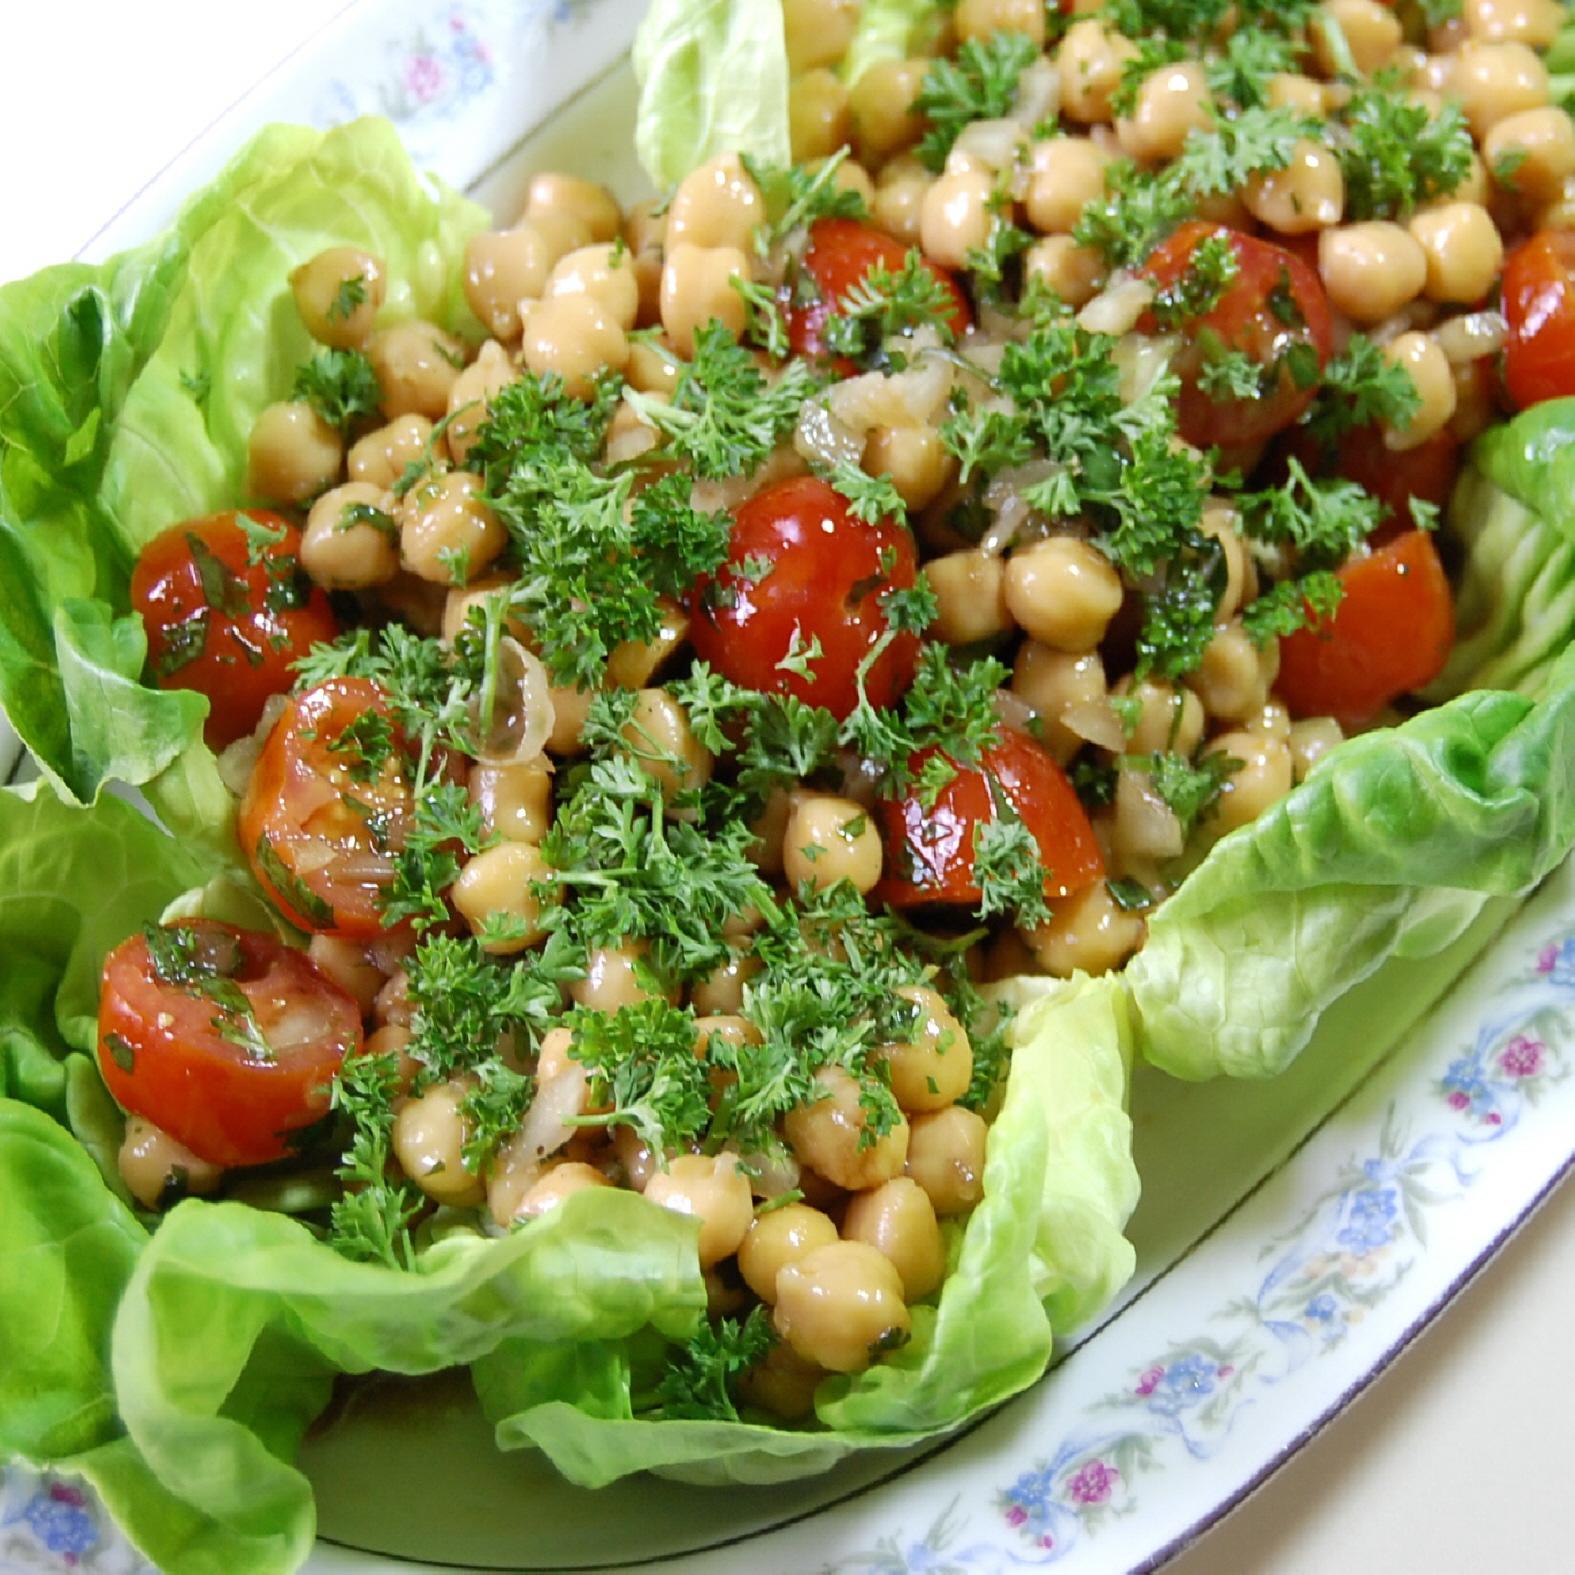 recipes magazine: Chickpea and Tomato Salad